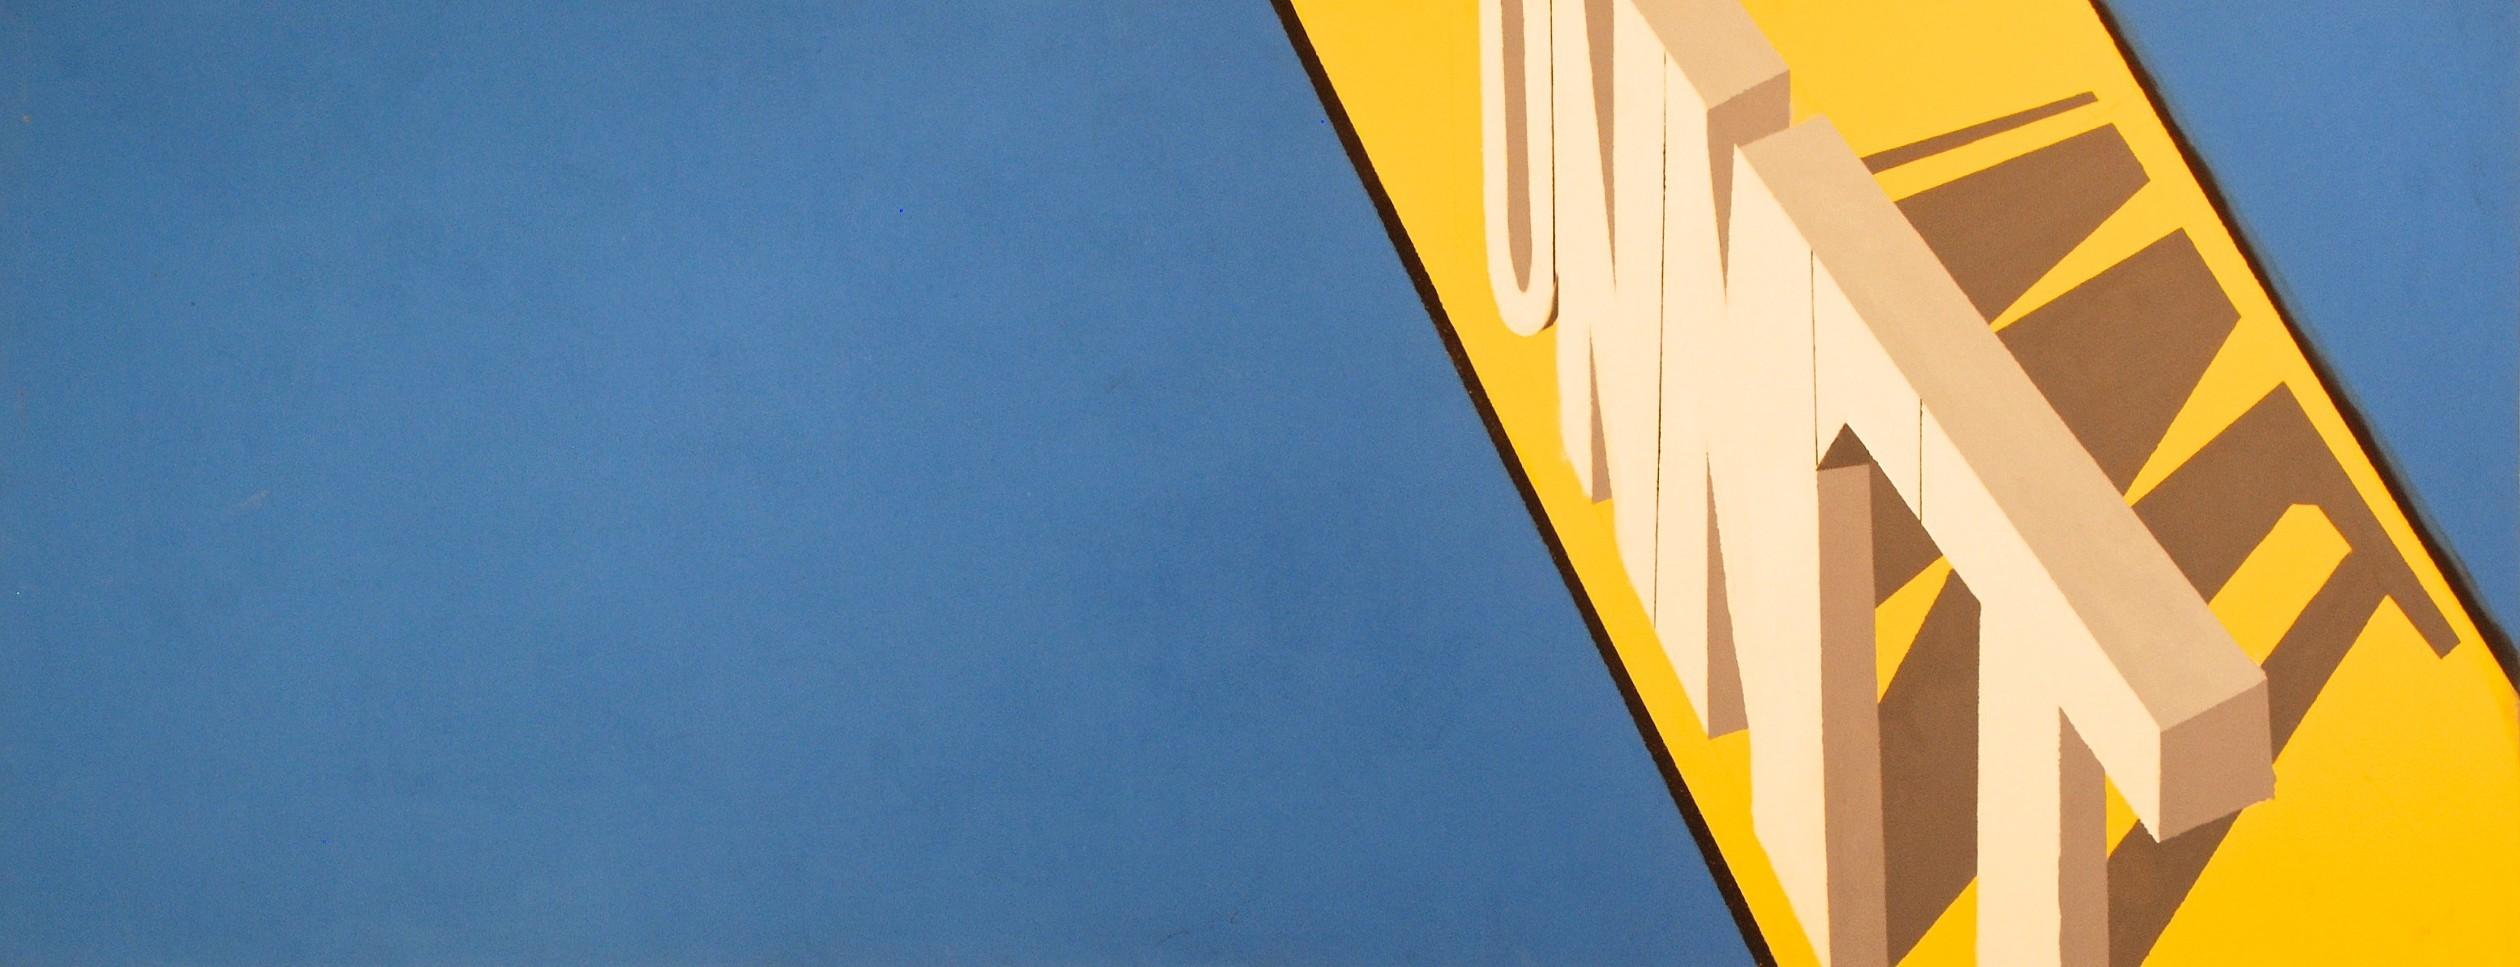 """Unn't"" by Jeffrey Roy Geesa"